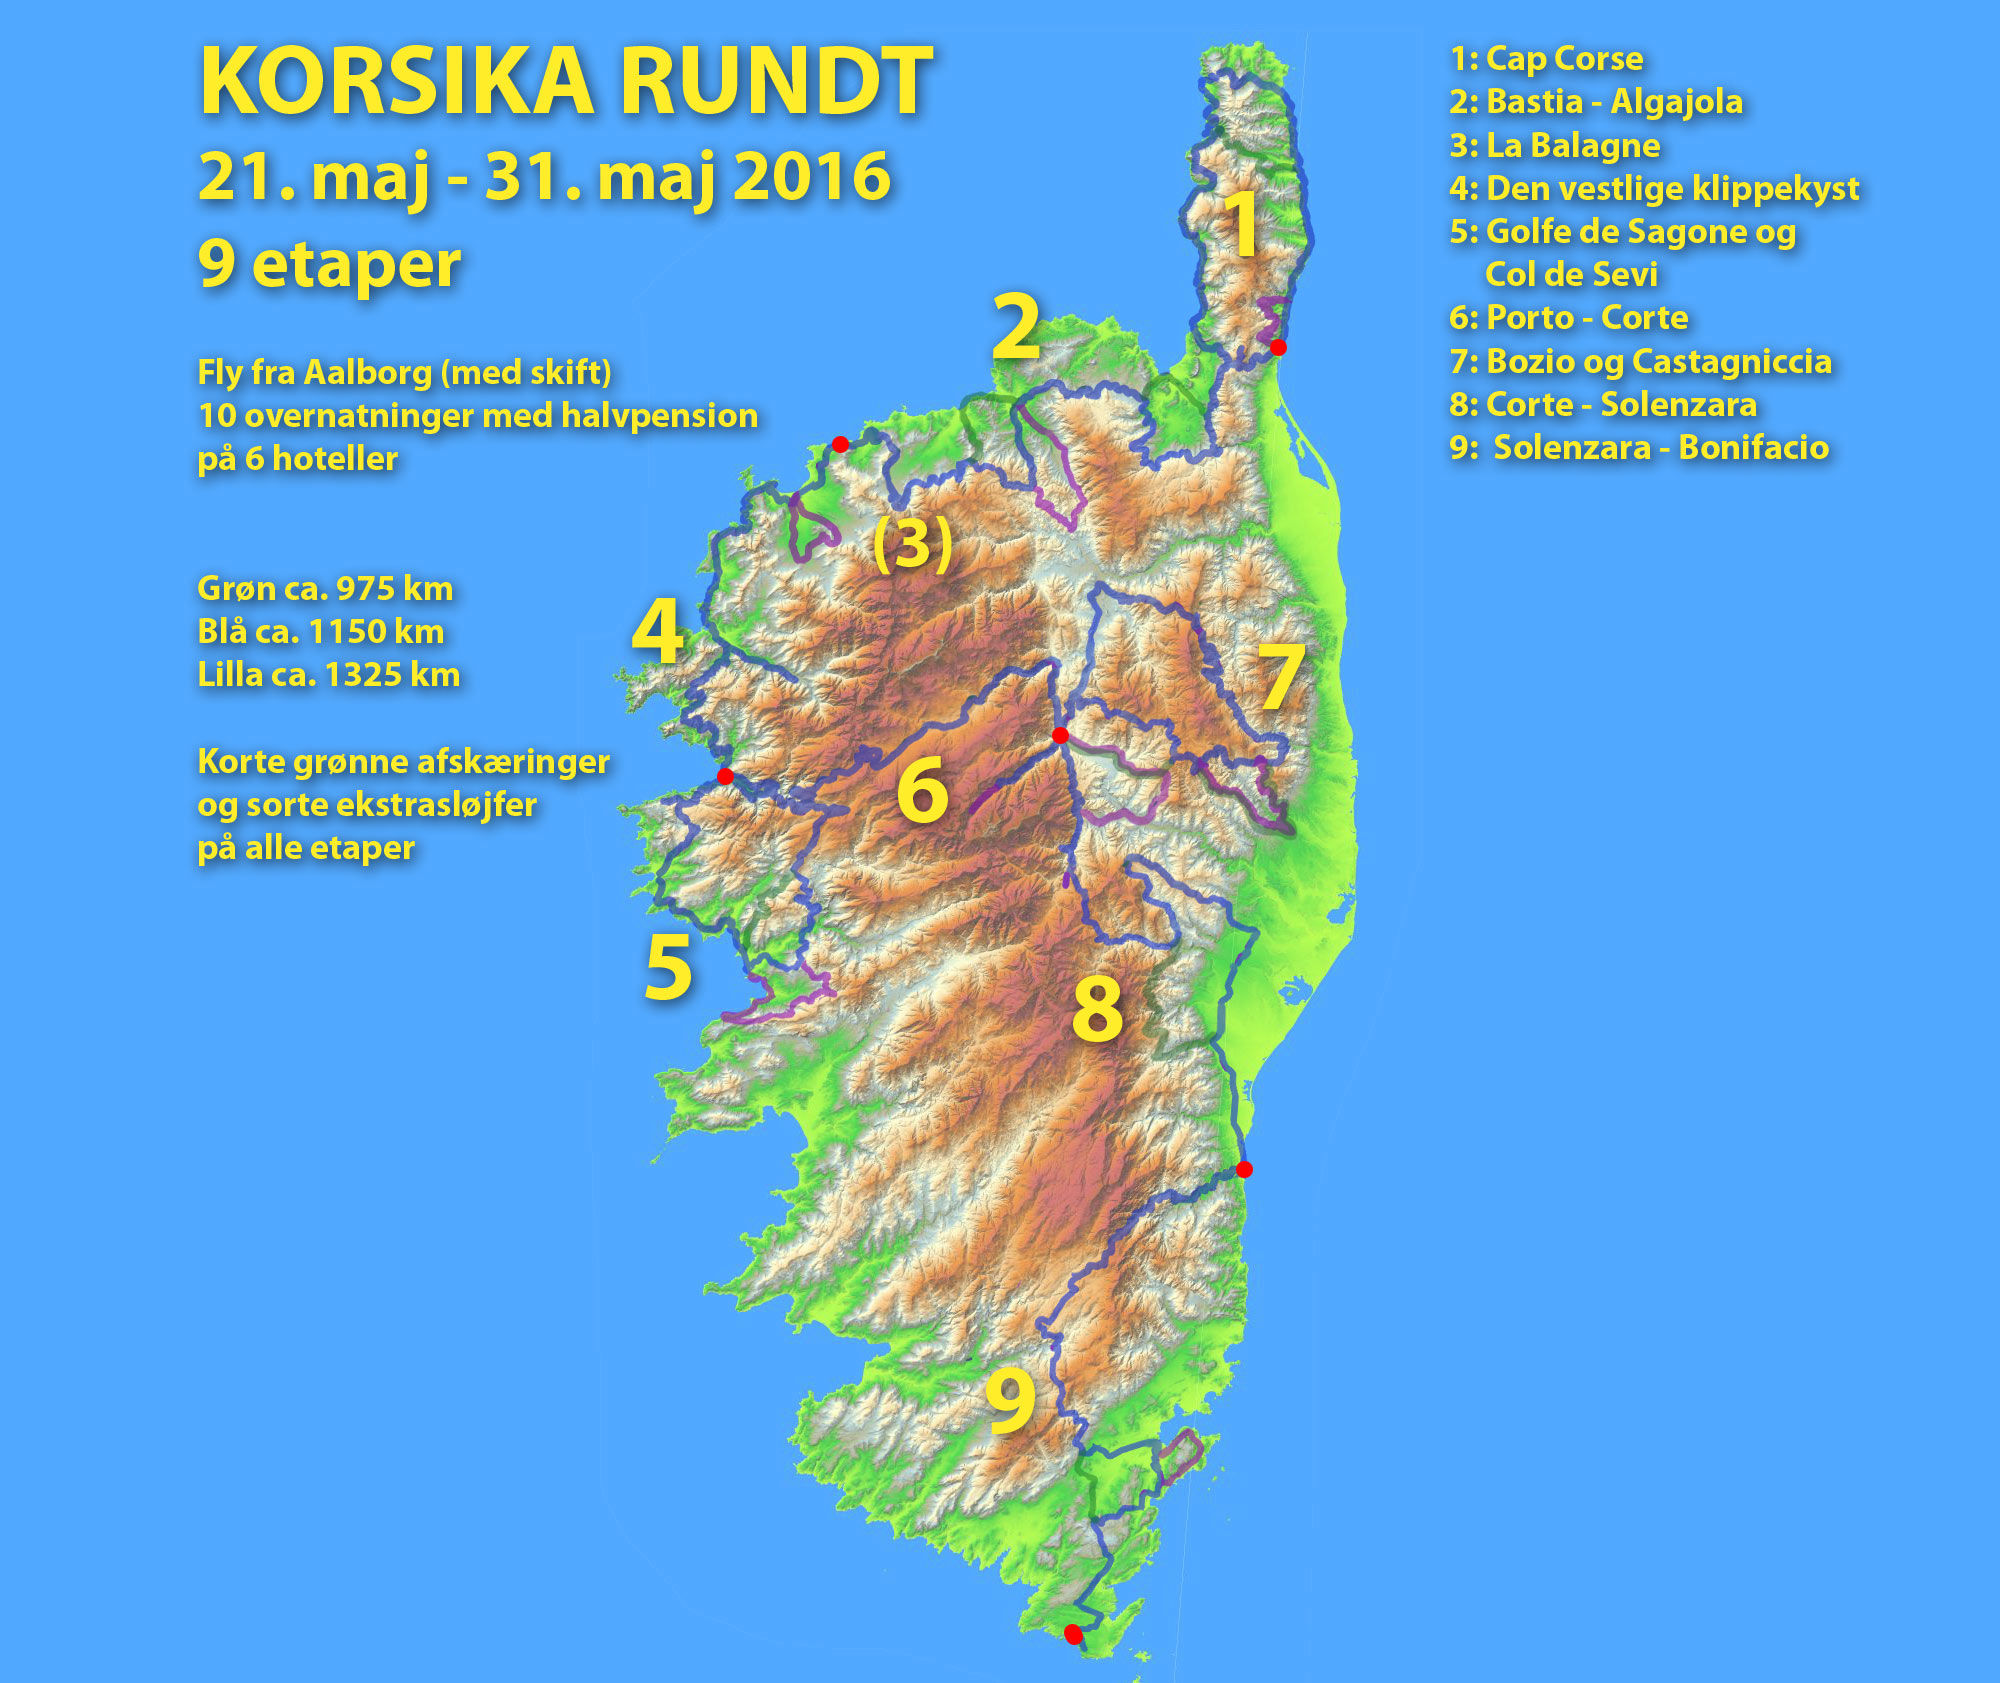 korsika kort Detaljeret Kort Over Korsika | Kort 2019